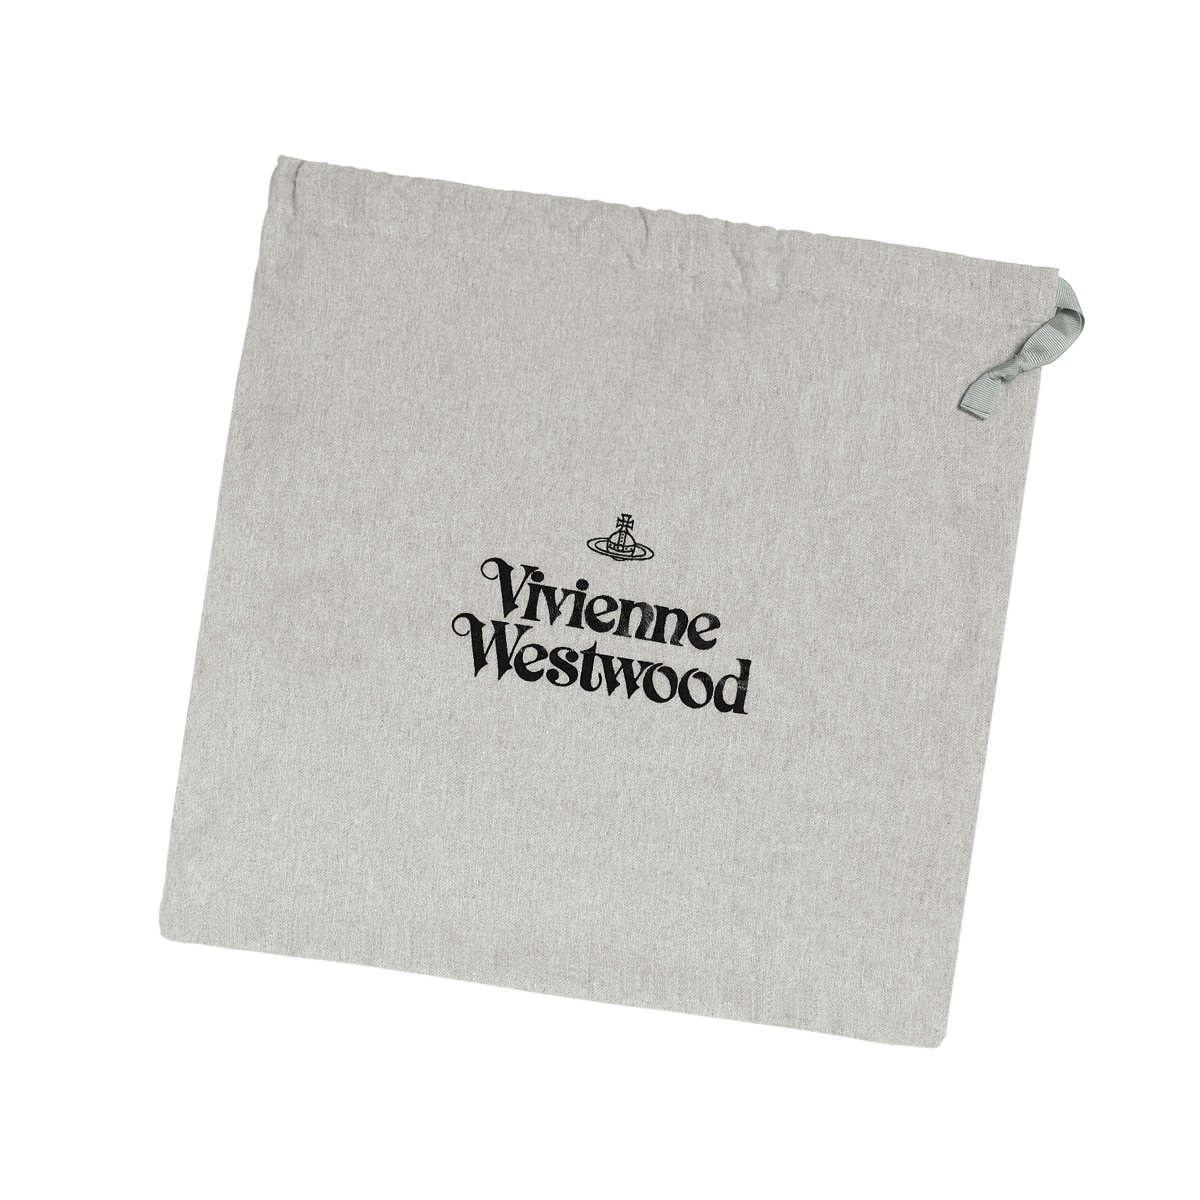 VIVIENNE WESTWOOD ヴィヴィアン ウエストウッド | ショルダーバッグ スモール | DERBY ダービー